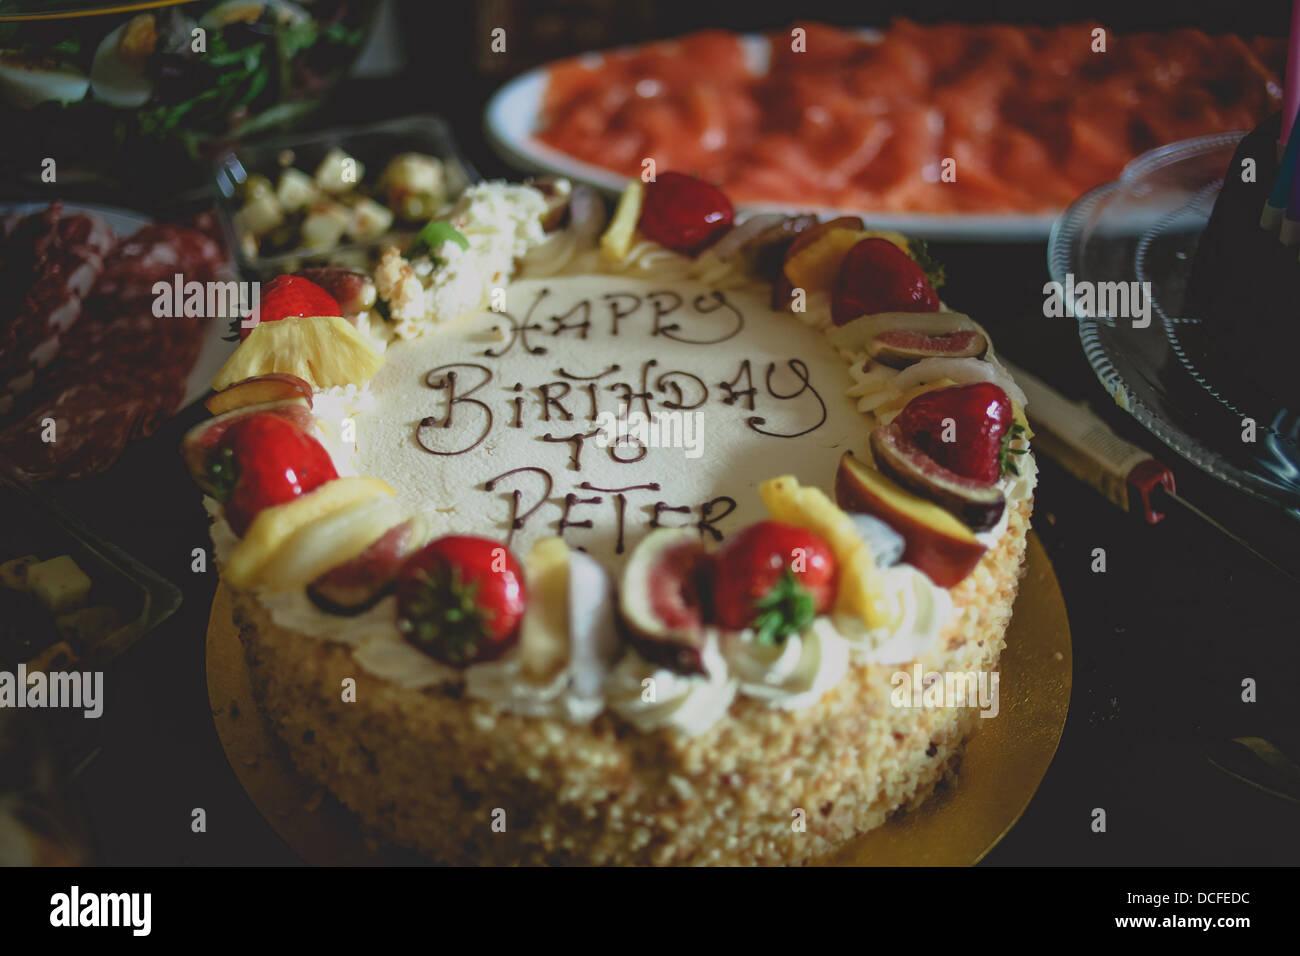 White Chocolate Birthday Cake To Peter Stock Photo 59347608 Alamy